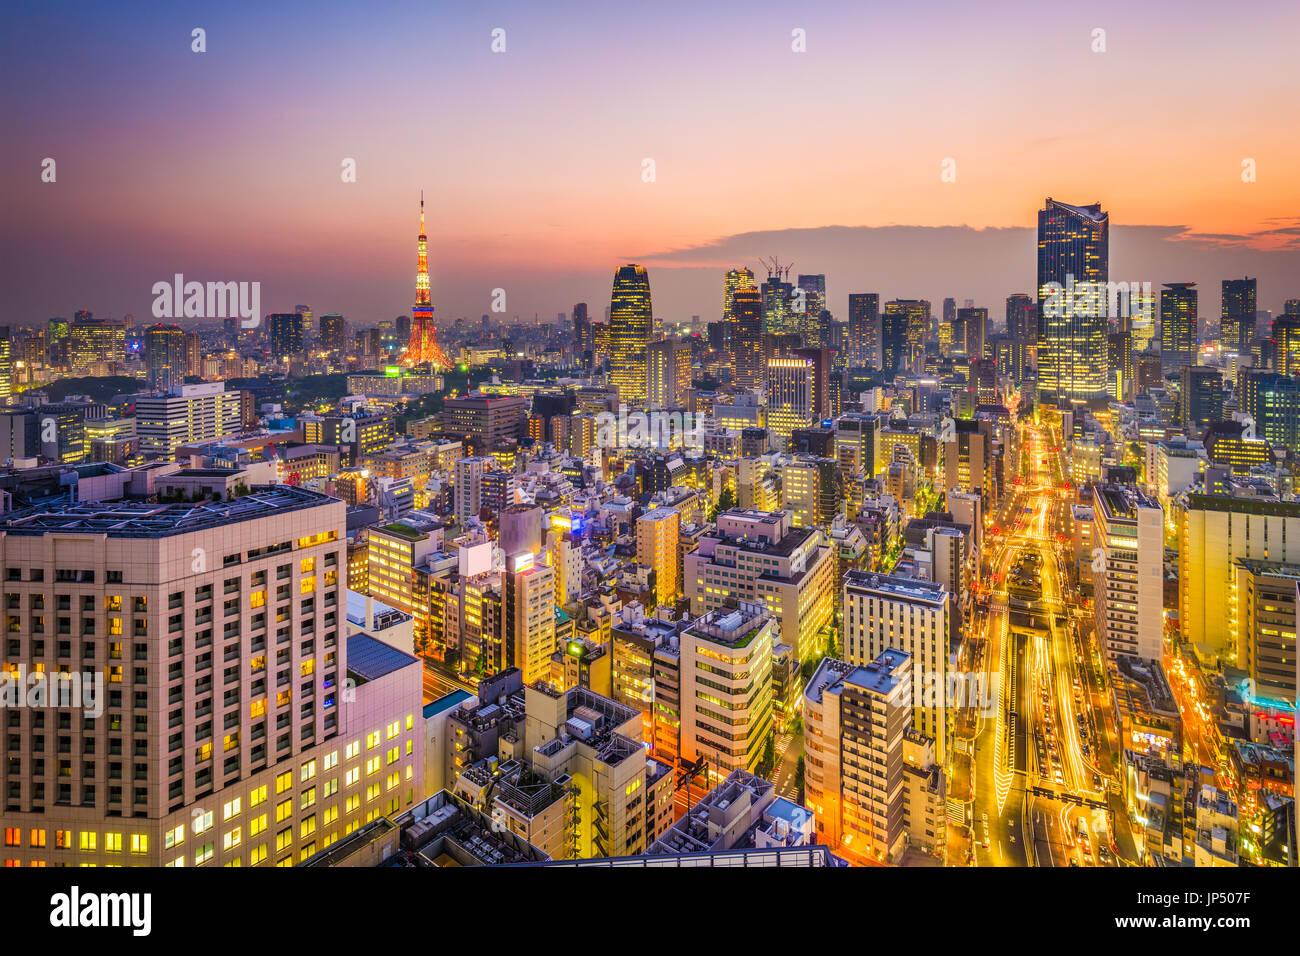 Tokyo, Japan Skyline at dusk. - Stock Image